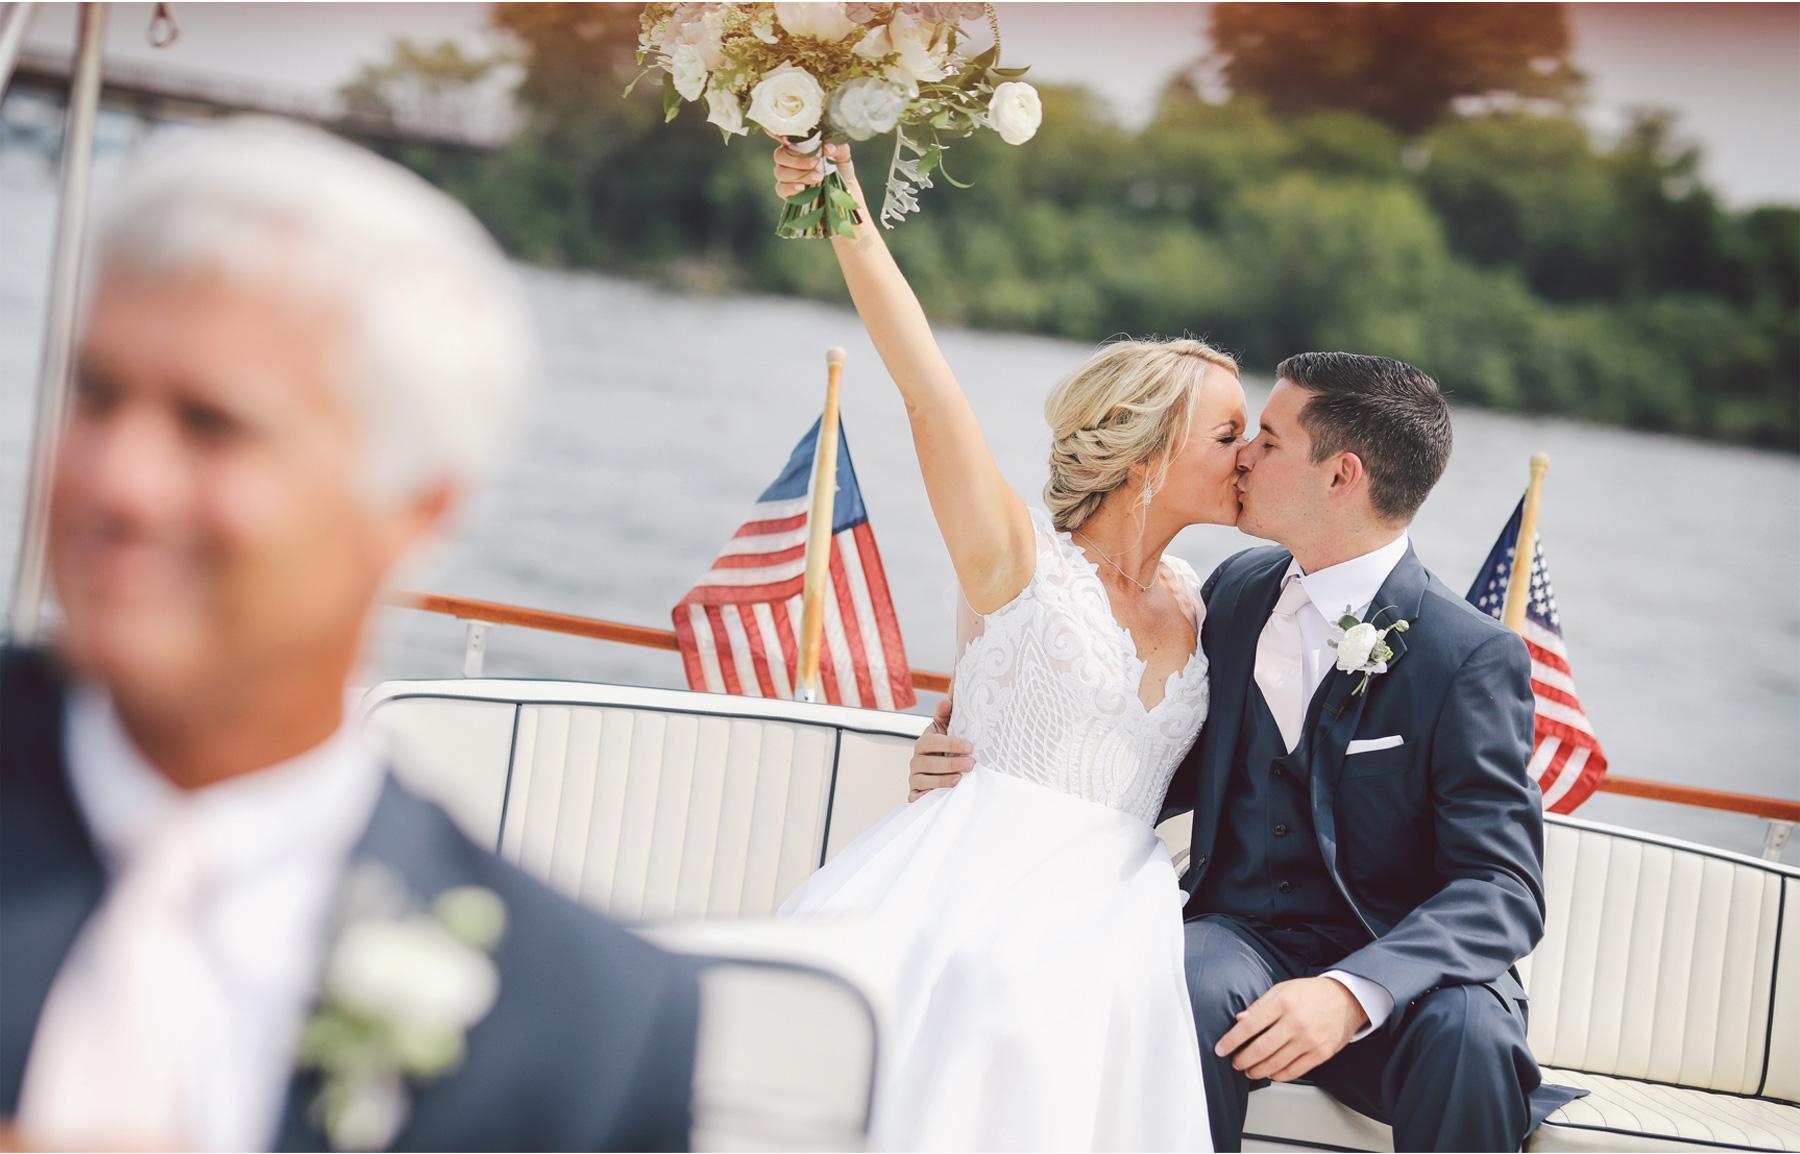 08-Minnetonka-Minnesota-Wedding-Photography-by-Vick-Photography-Boat-Lake-Minnetonka-First-Meeting-Toast-Jennifer-and-Adam.jpg